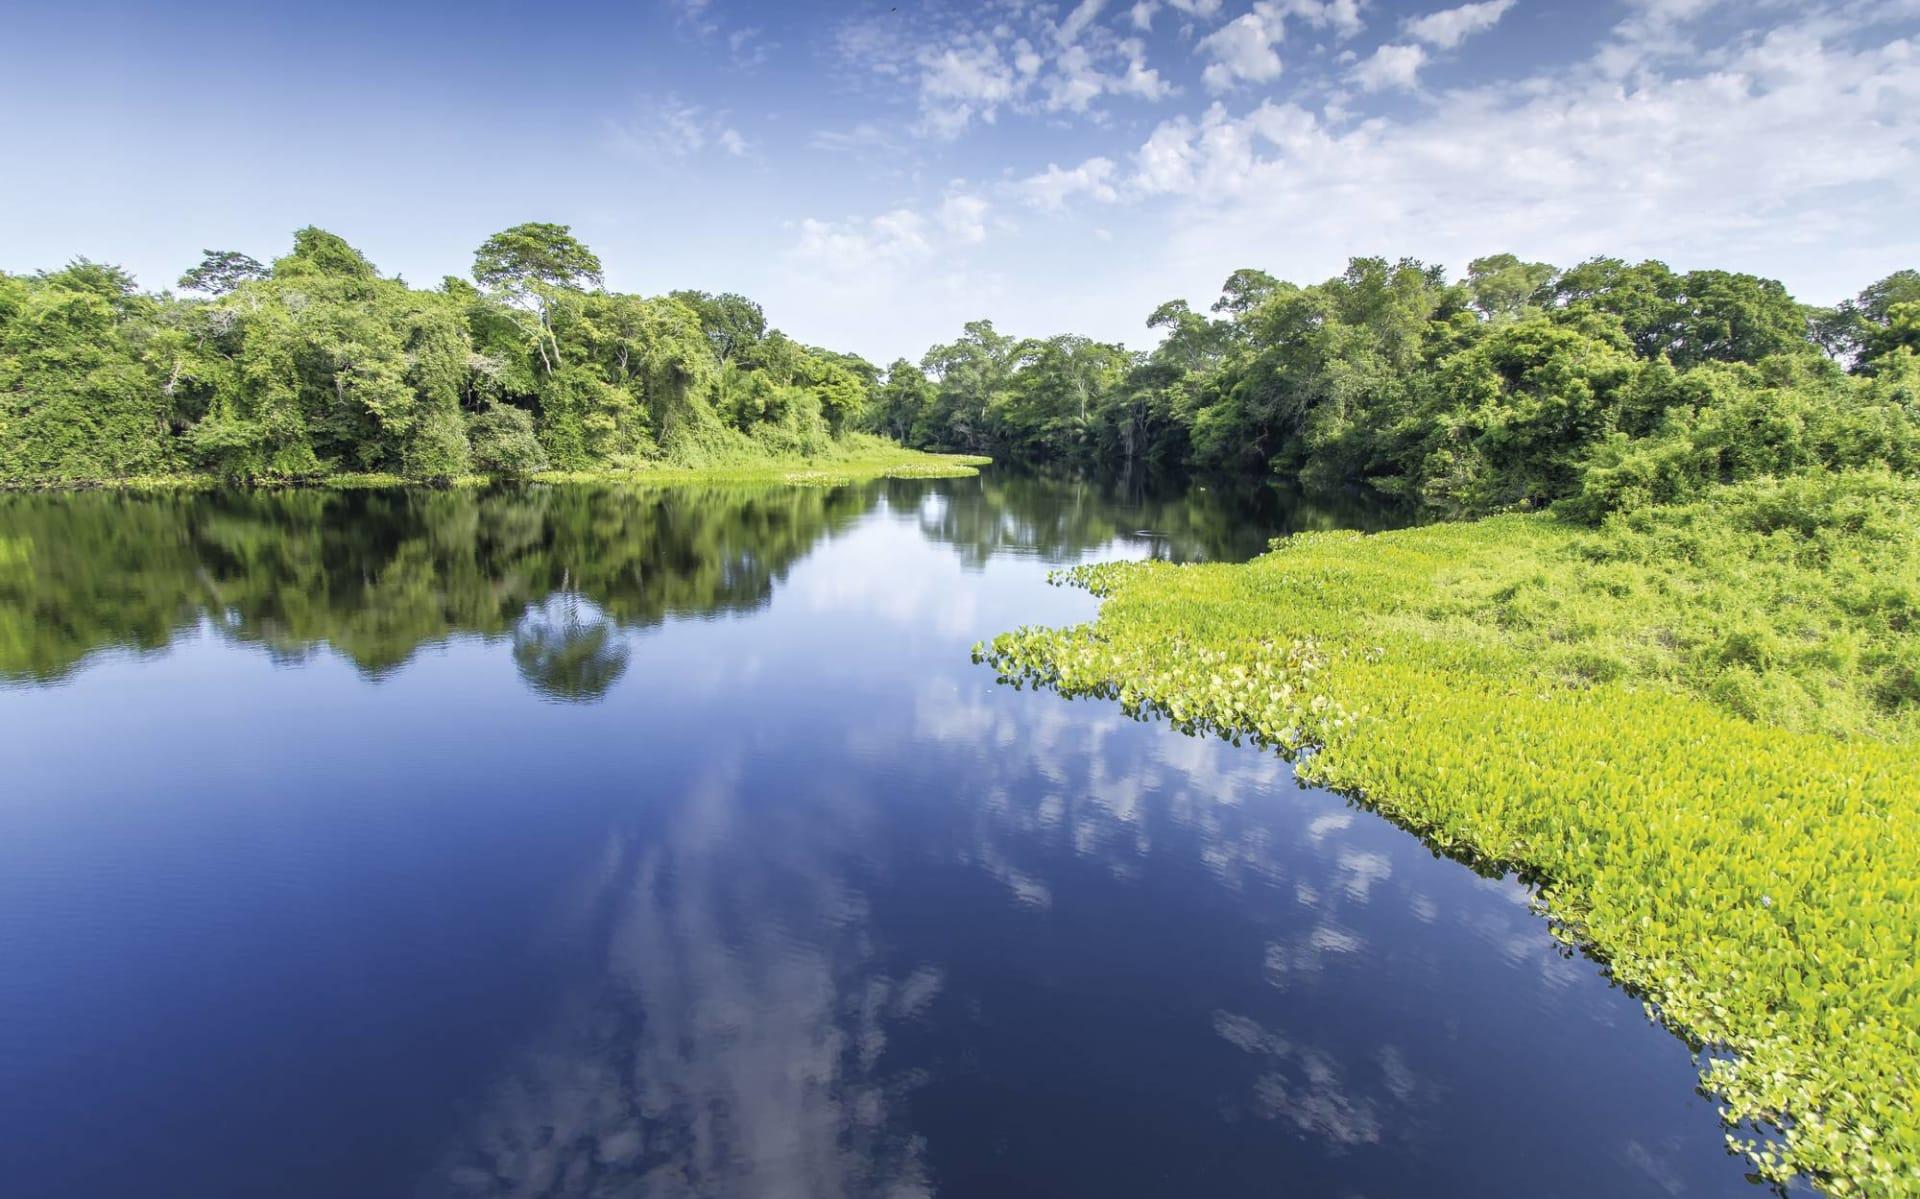 Flussfahrt mit der Tucano ab Manaus: Brasilien - Amazonas - Pantanal